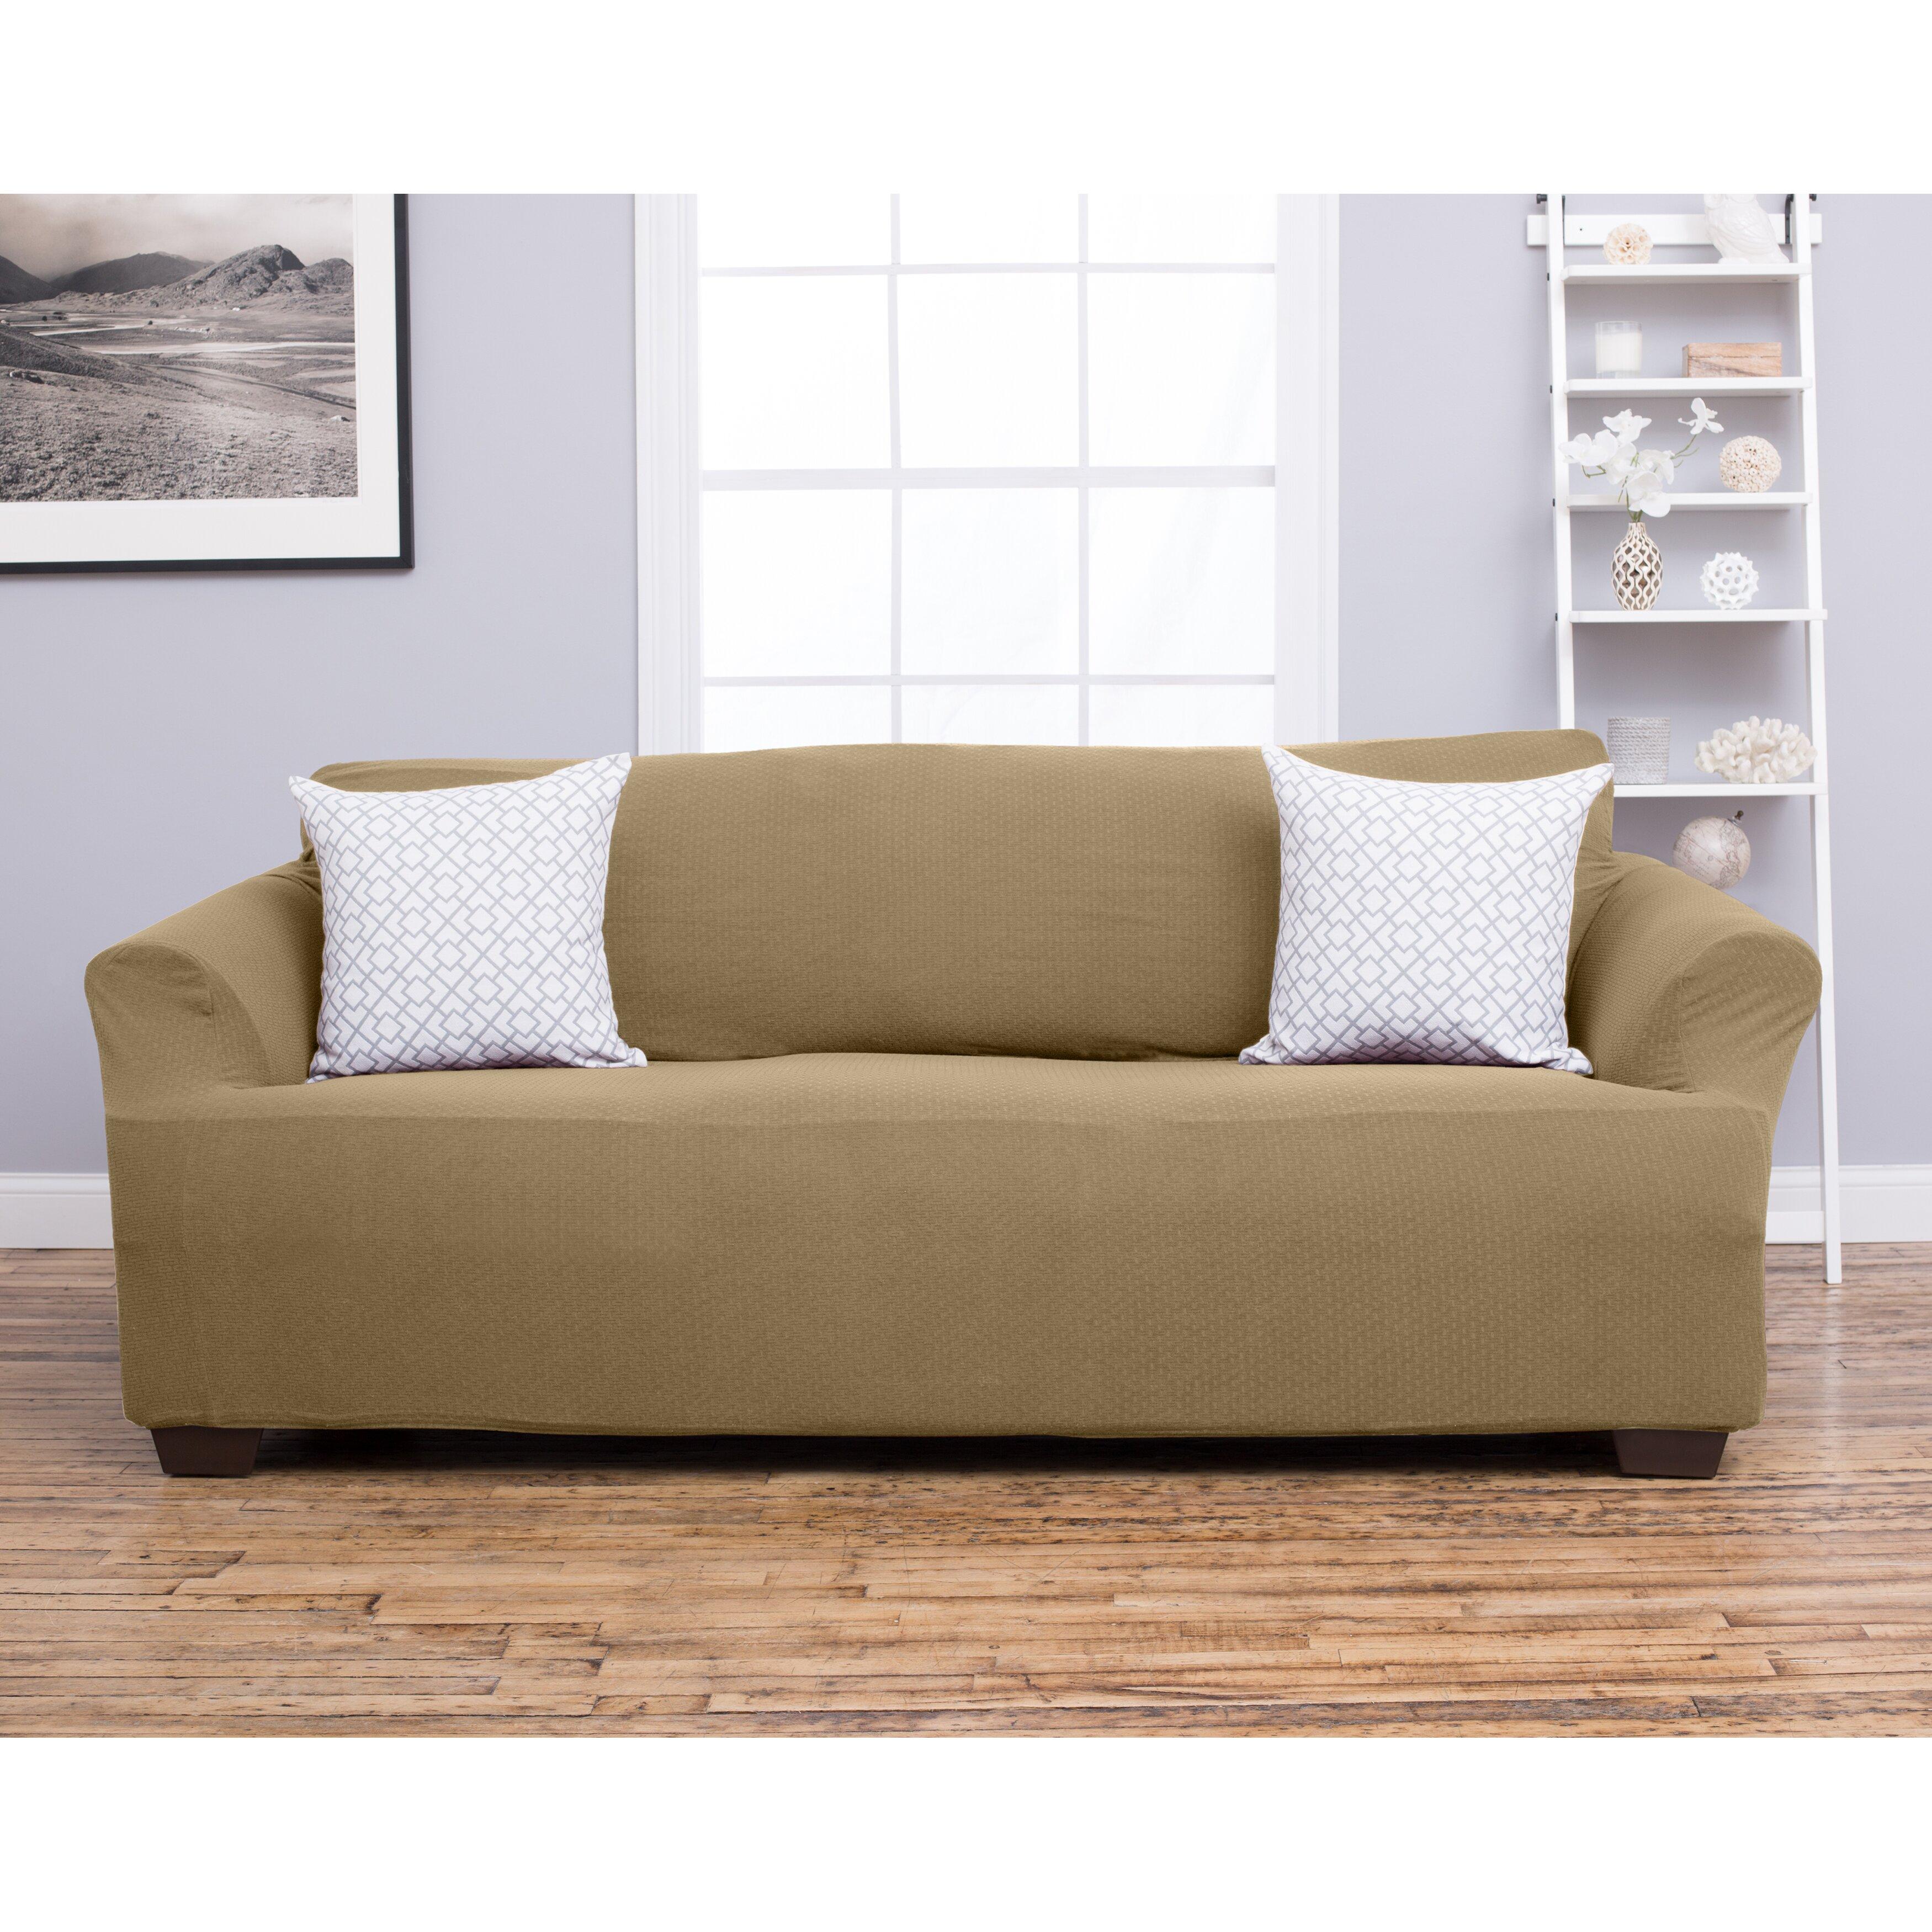 home fashion design amilio sofa slipcover reviews. Black Bedroom Furniture Sets. Home Design Ideas